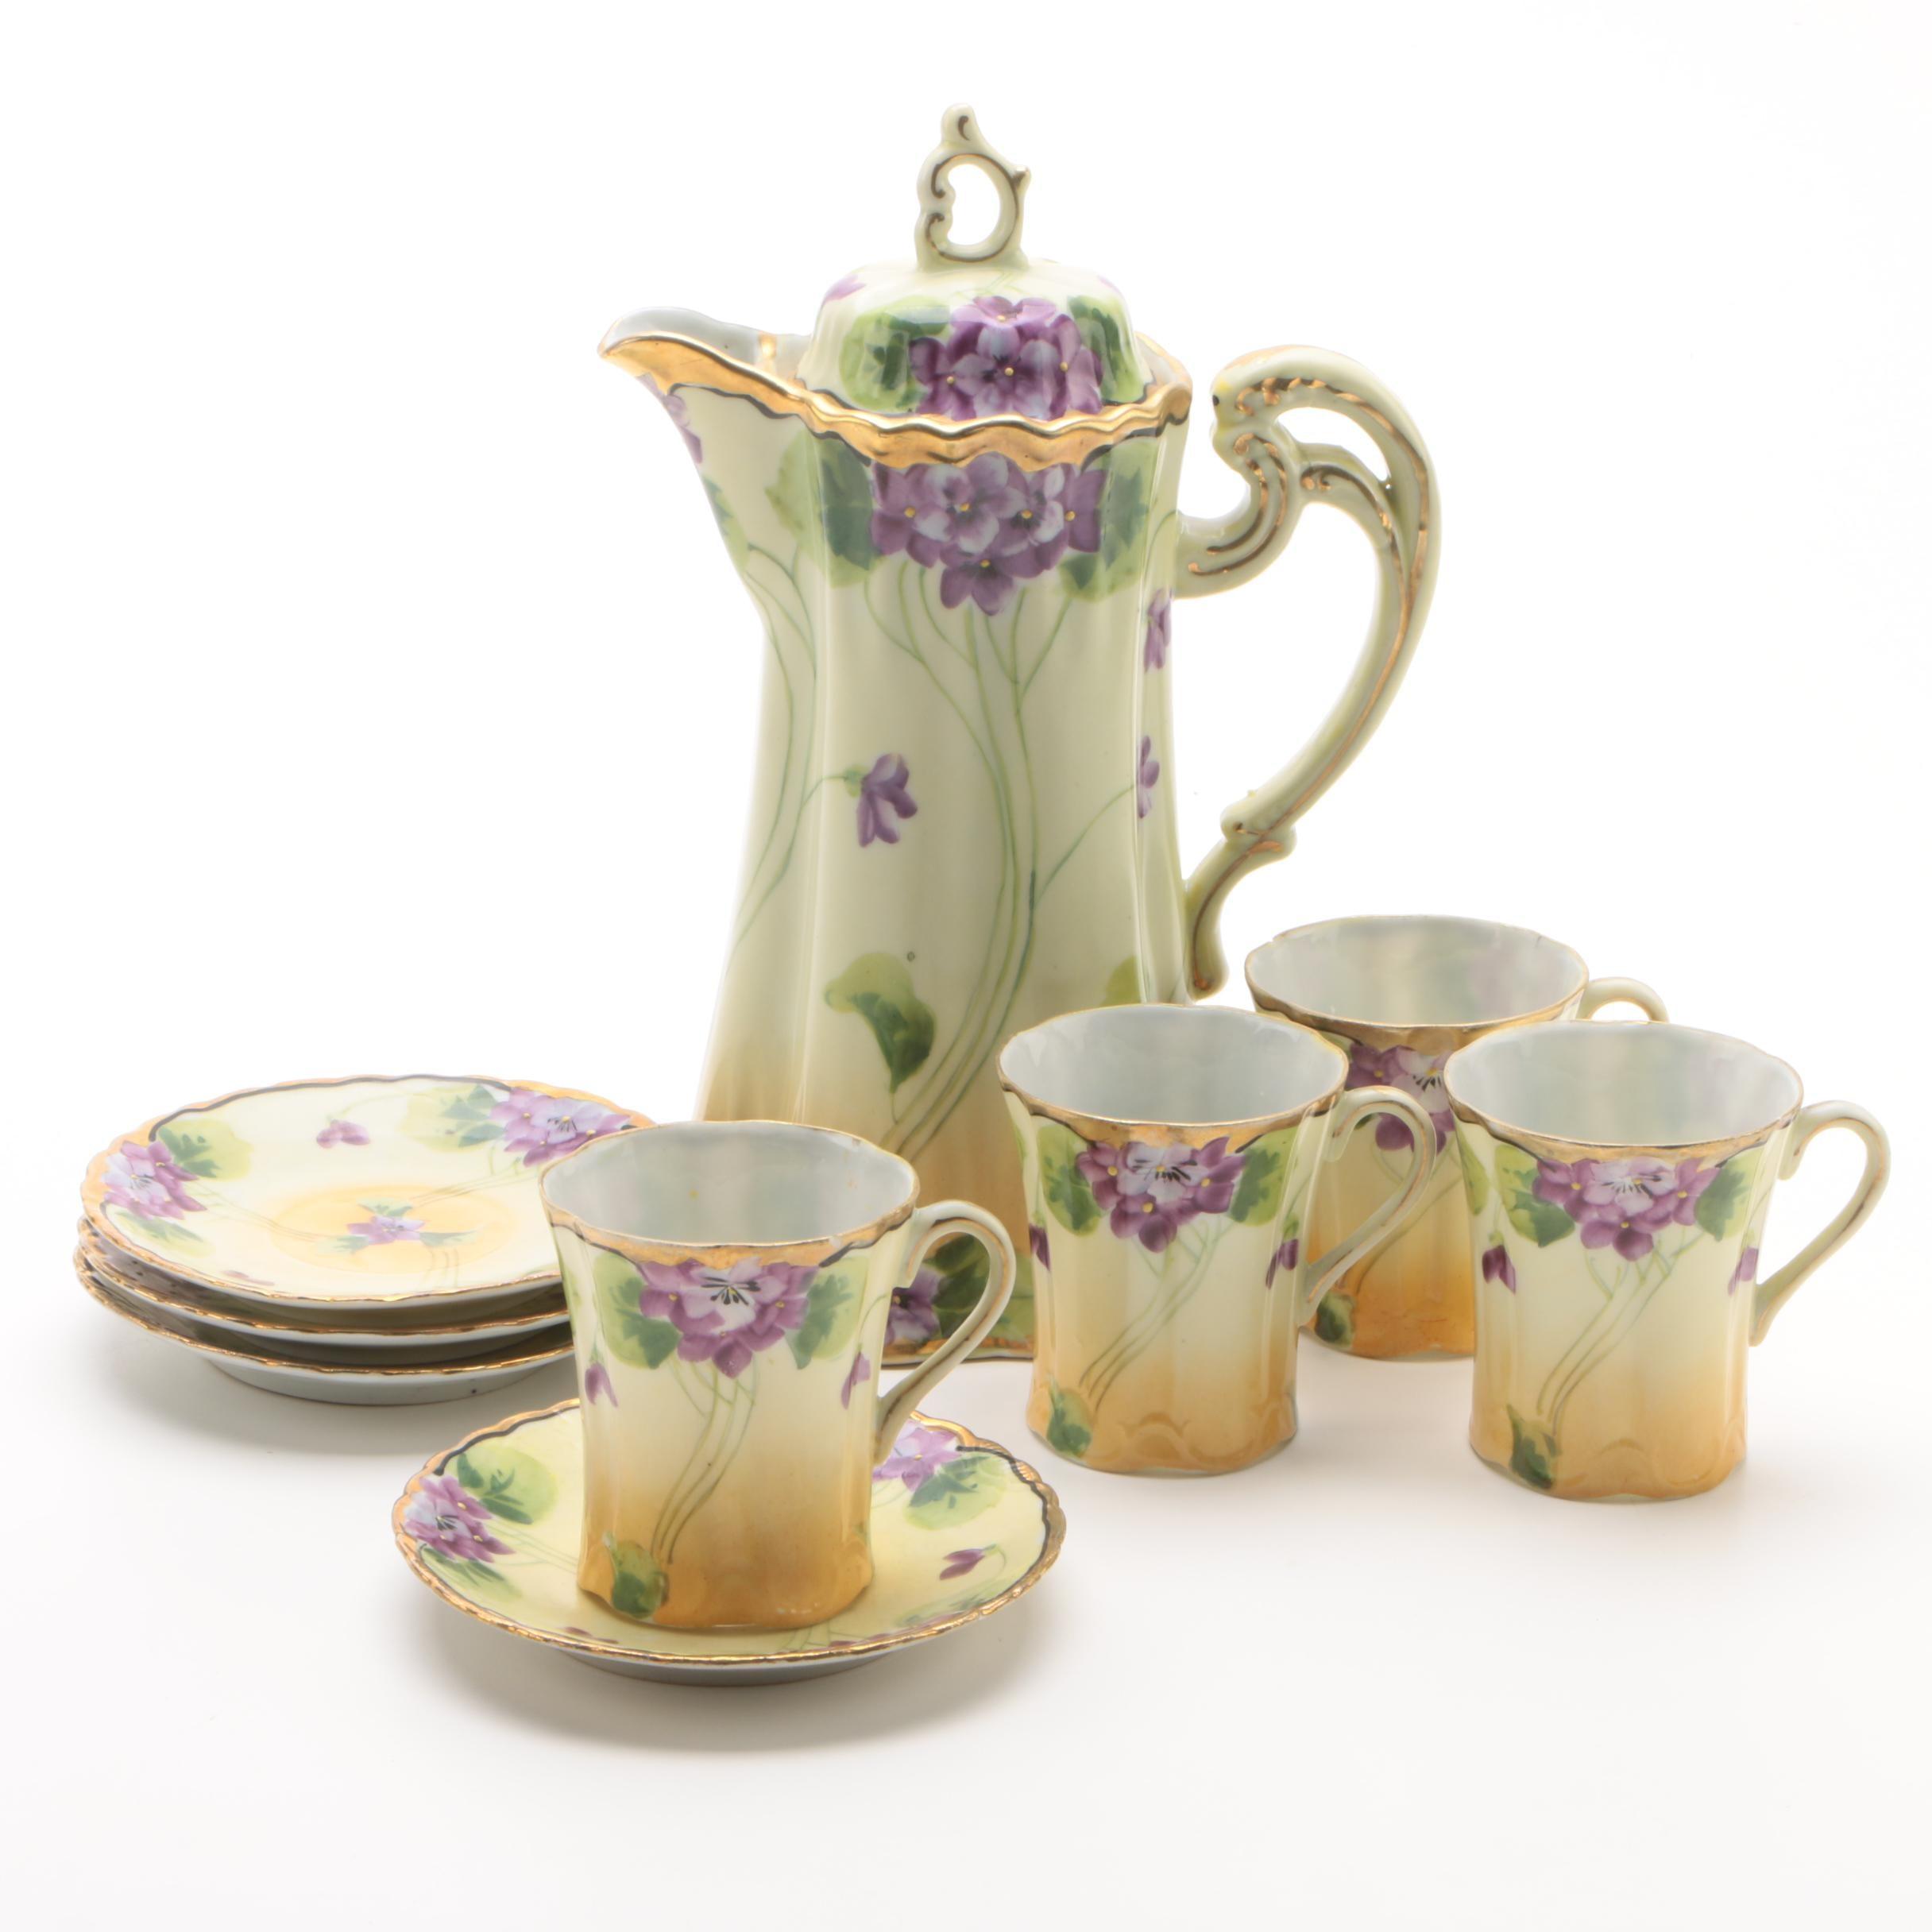 Vintage Japanese Hand-Painted Porcelain Chocolate Set